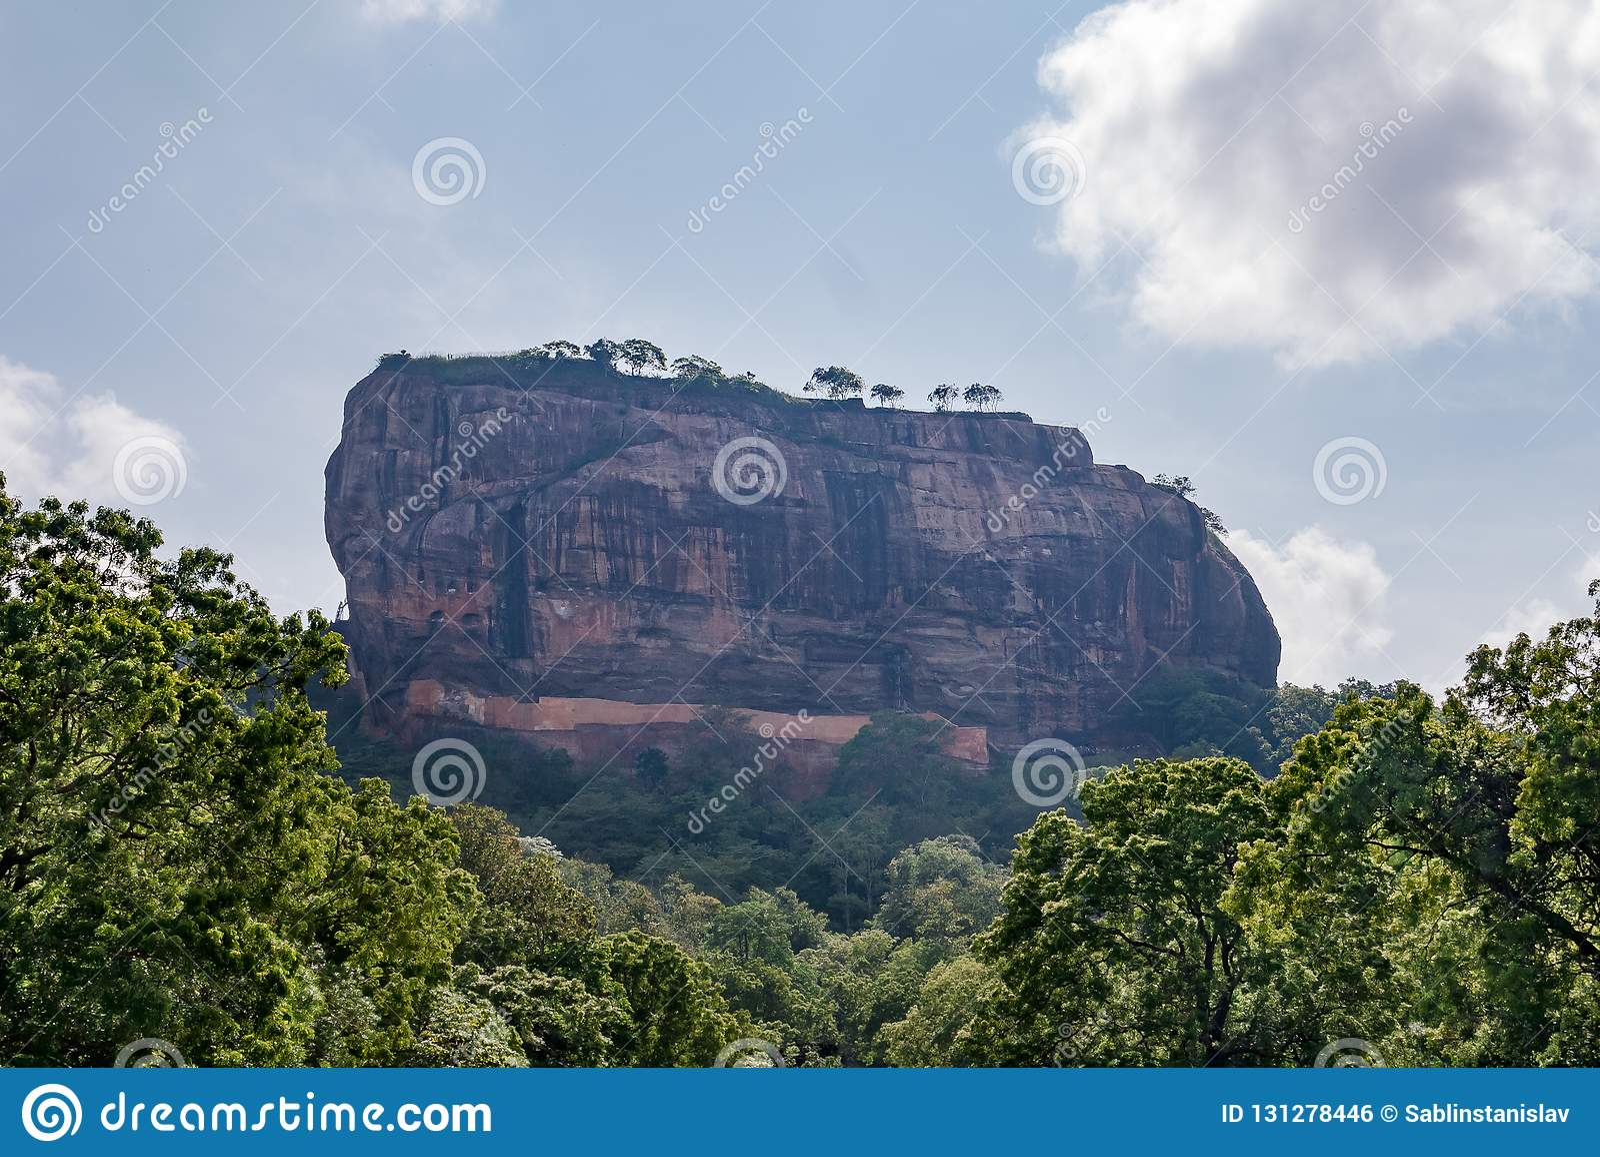 Sitio 'fortaleza del patrimonio mundial de la UNESCO en el cielo ' Sigiriya Sri Lanka